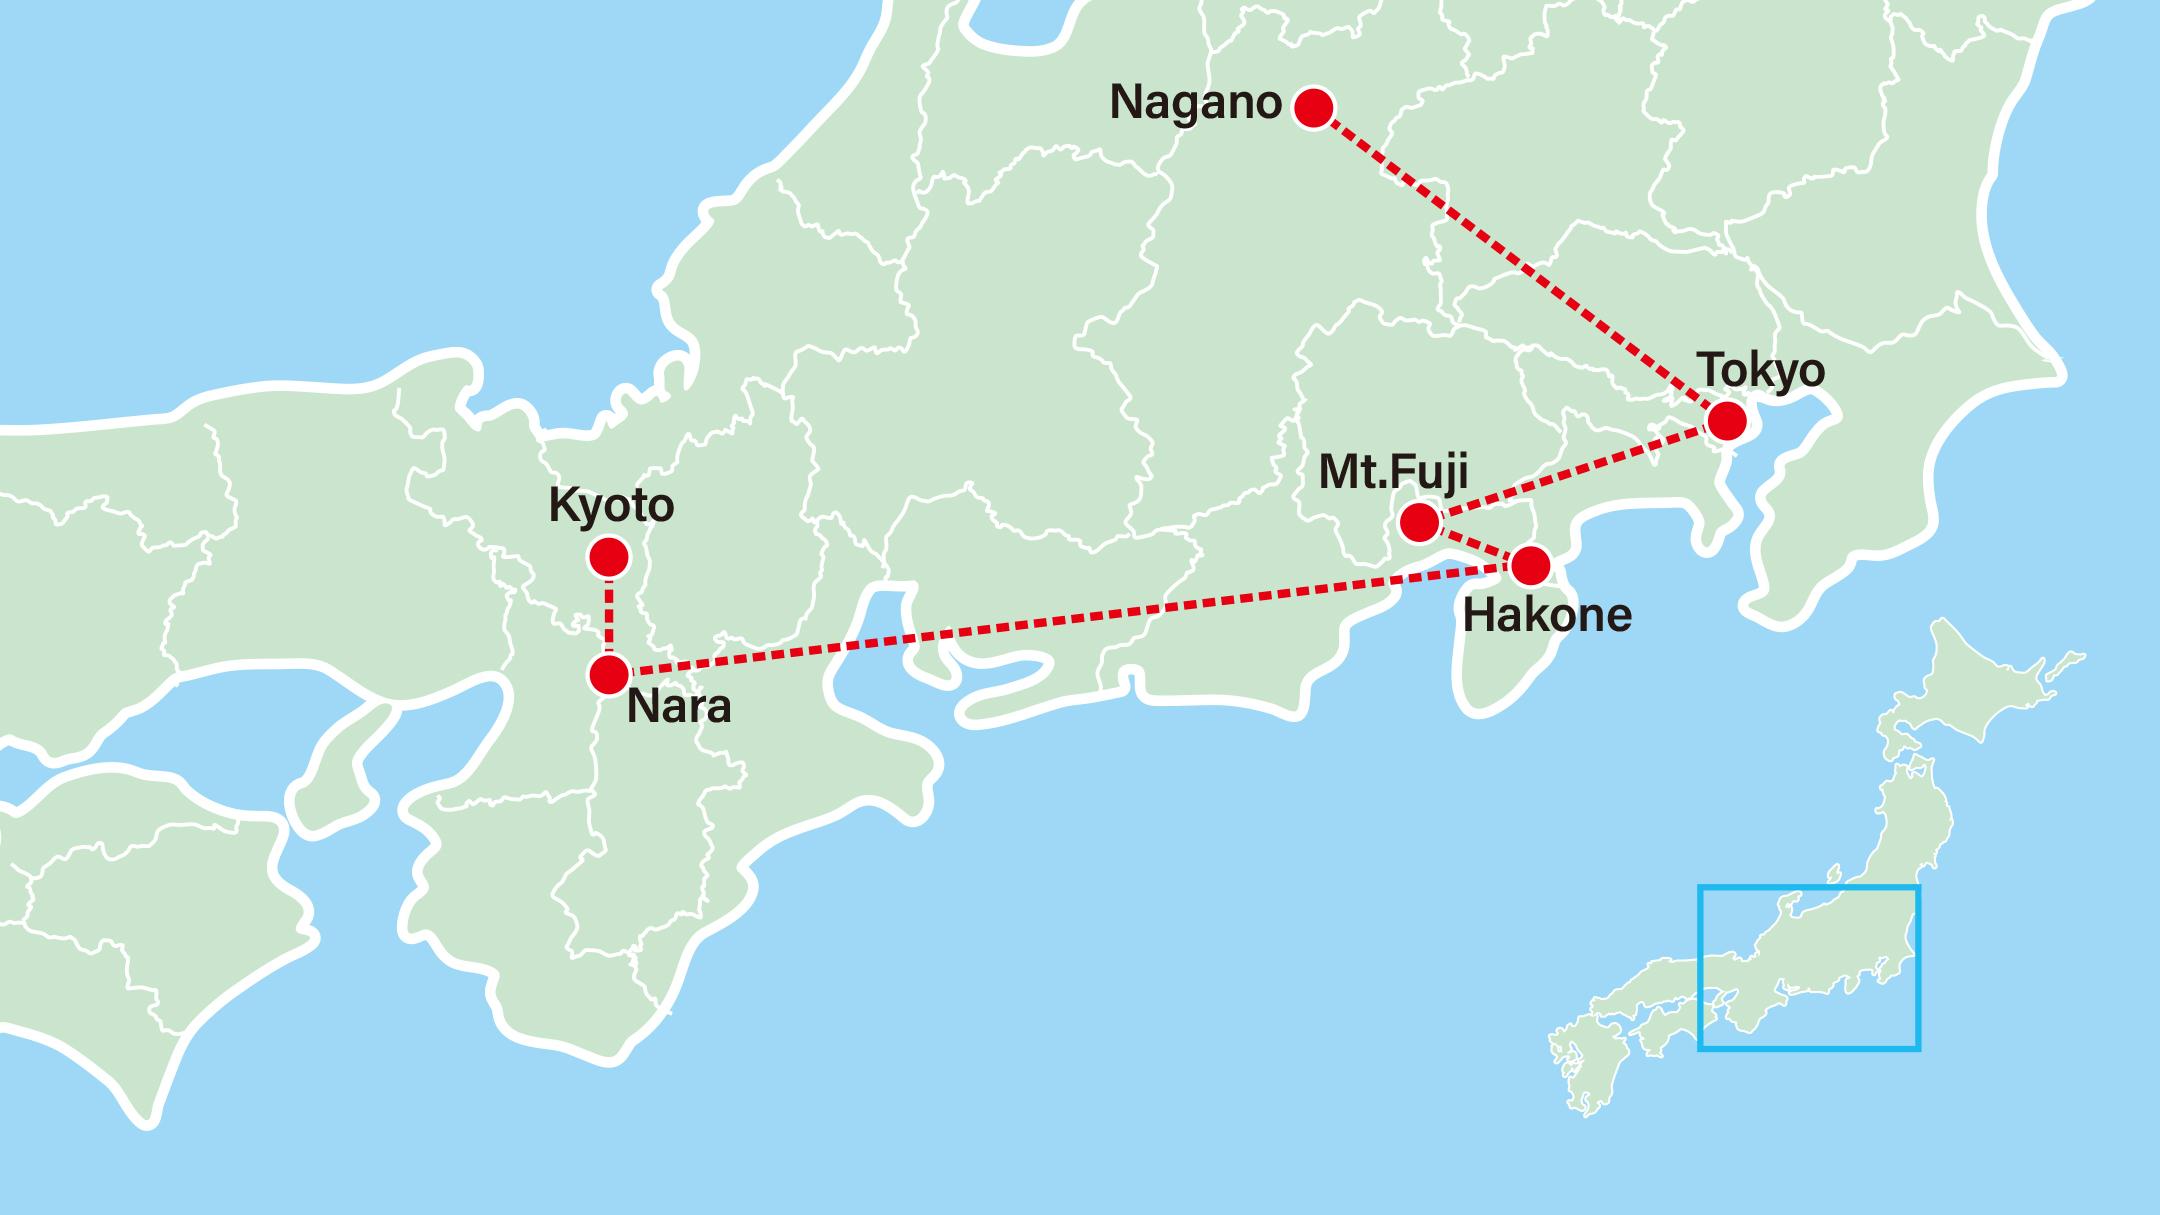 Winter Discovery - Snow Monkey & Anime 9 Days -Tokyo-Nagano-Hakone-Kyoto-Nara